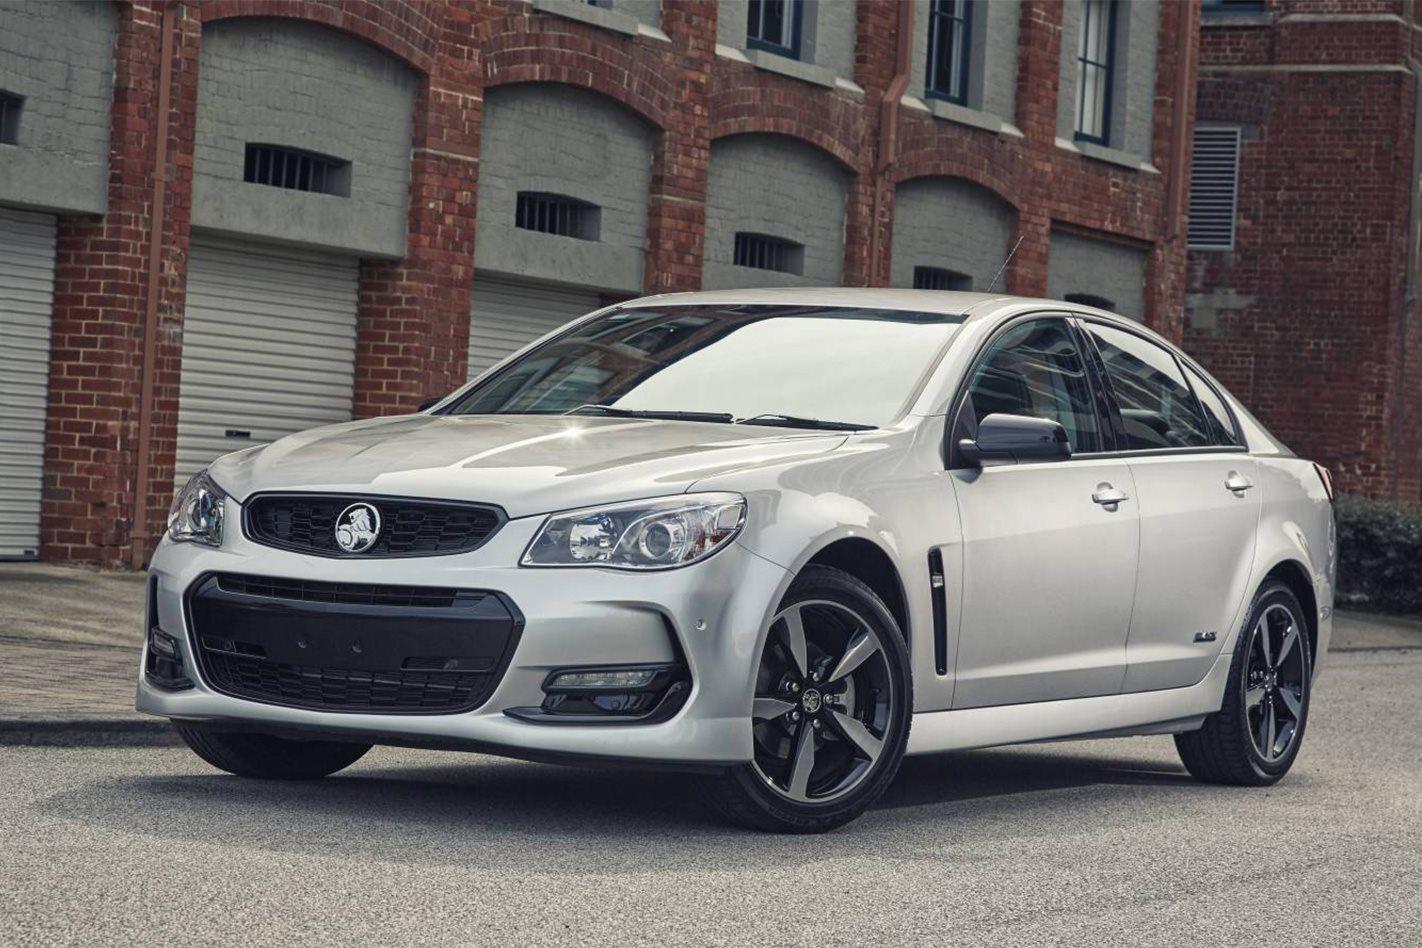 Holden kills Commodore SV6 manual